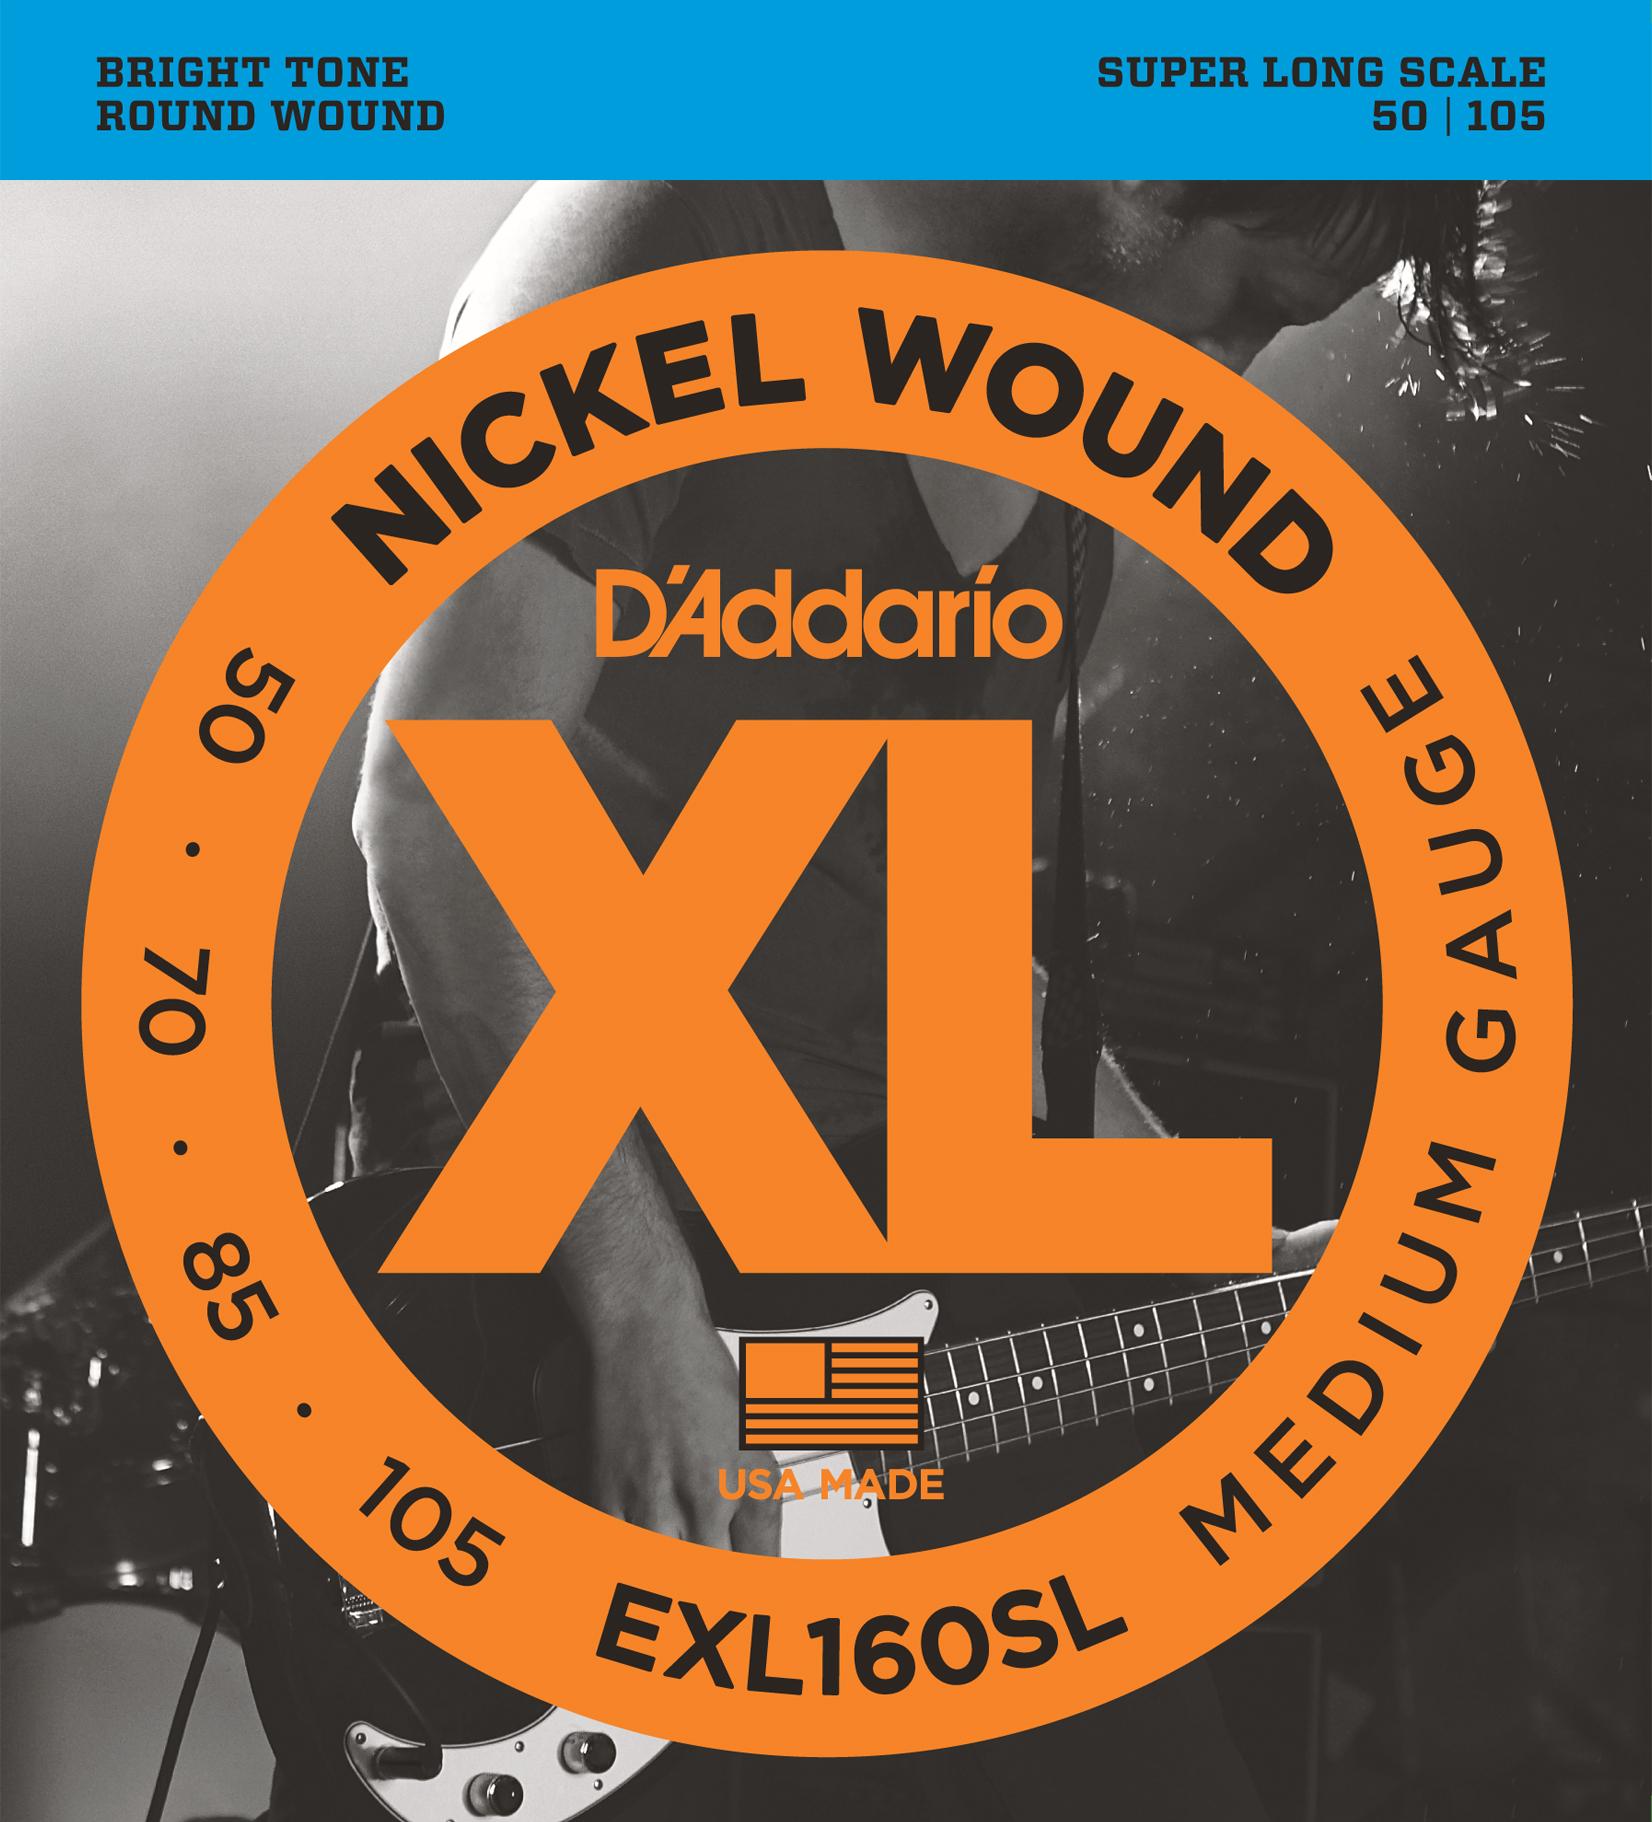 D'Addario EXL160SL Nickel Wound Bass Guitar Strings, Medium, 50-105, Super Long ...